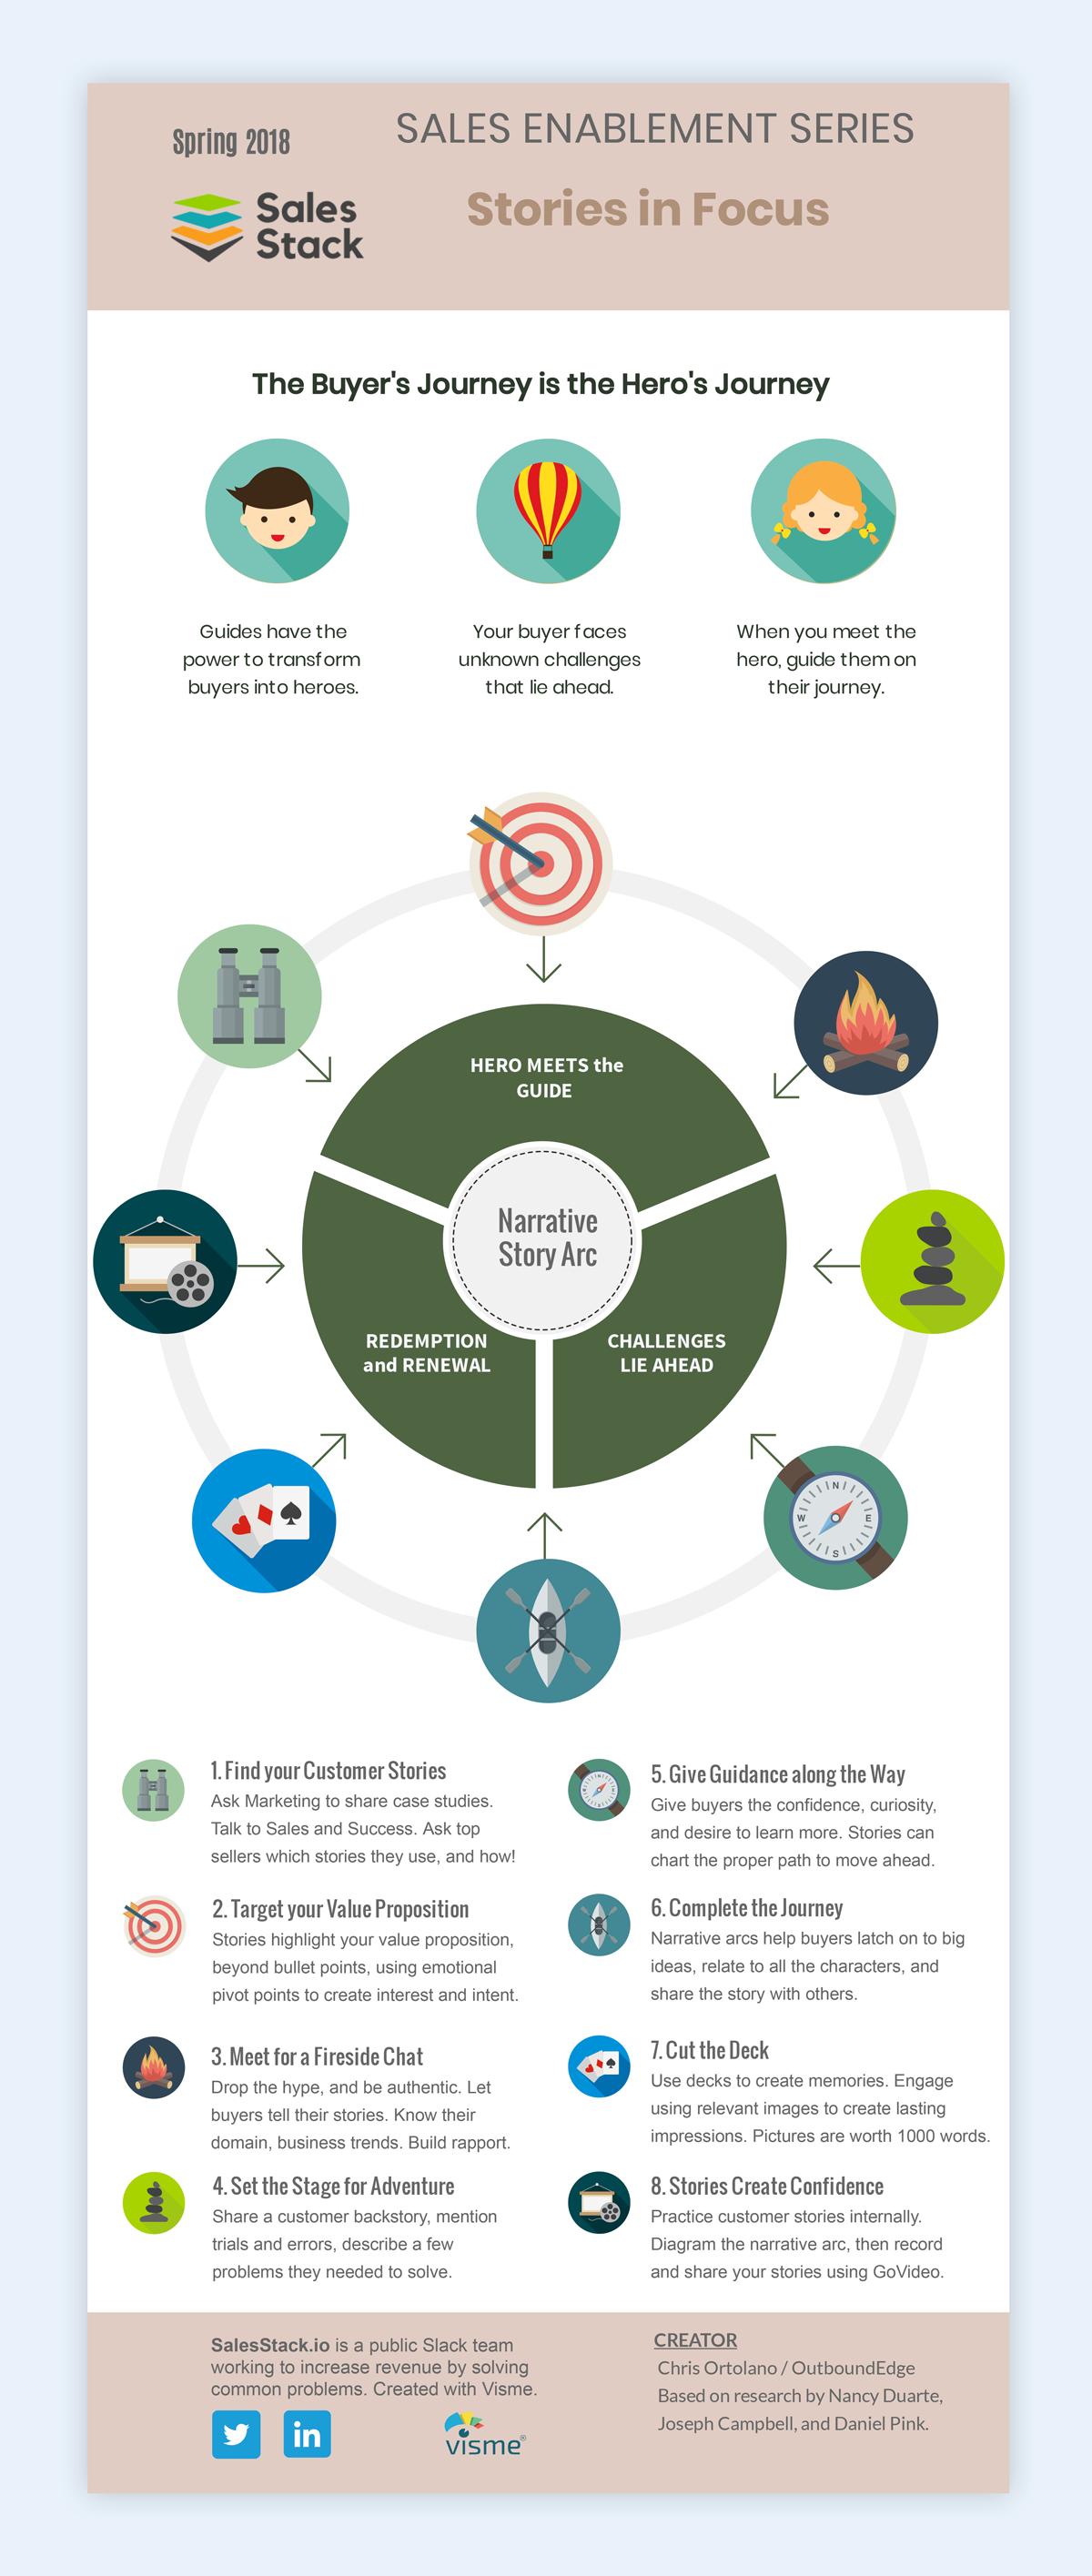 sales enablement infographic sales storytelling buyer's journey hero's journey